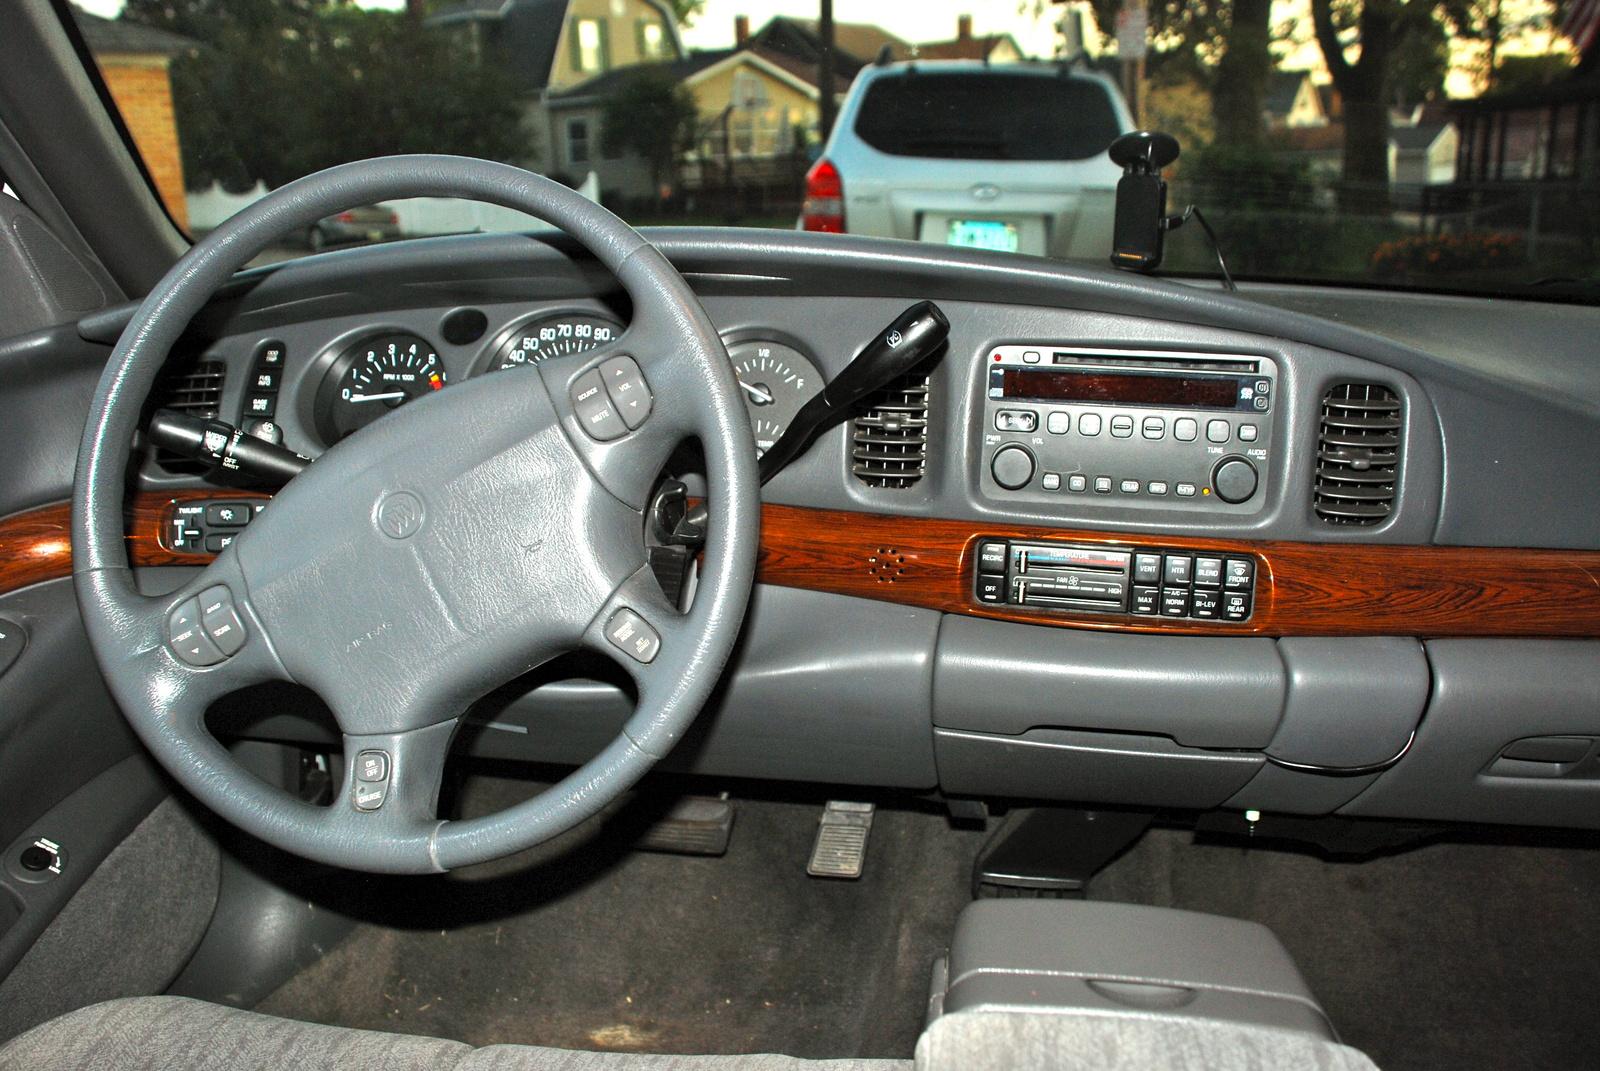 2005 Buick Lesabre Custom Pic 2071466010843569007 Jpeg 1600 1071 Buick Lesabre Buick Sweet Ride